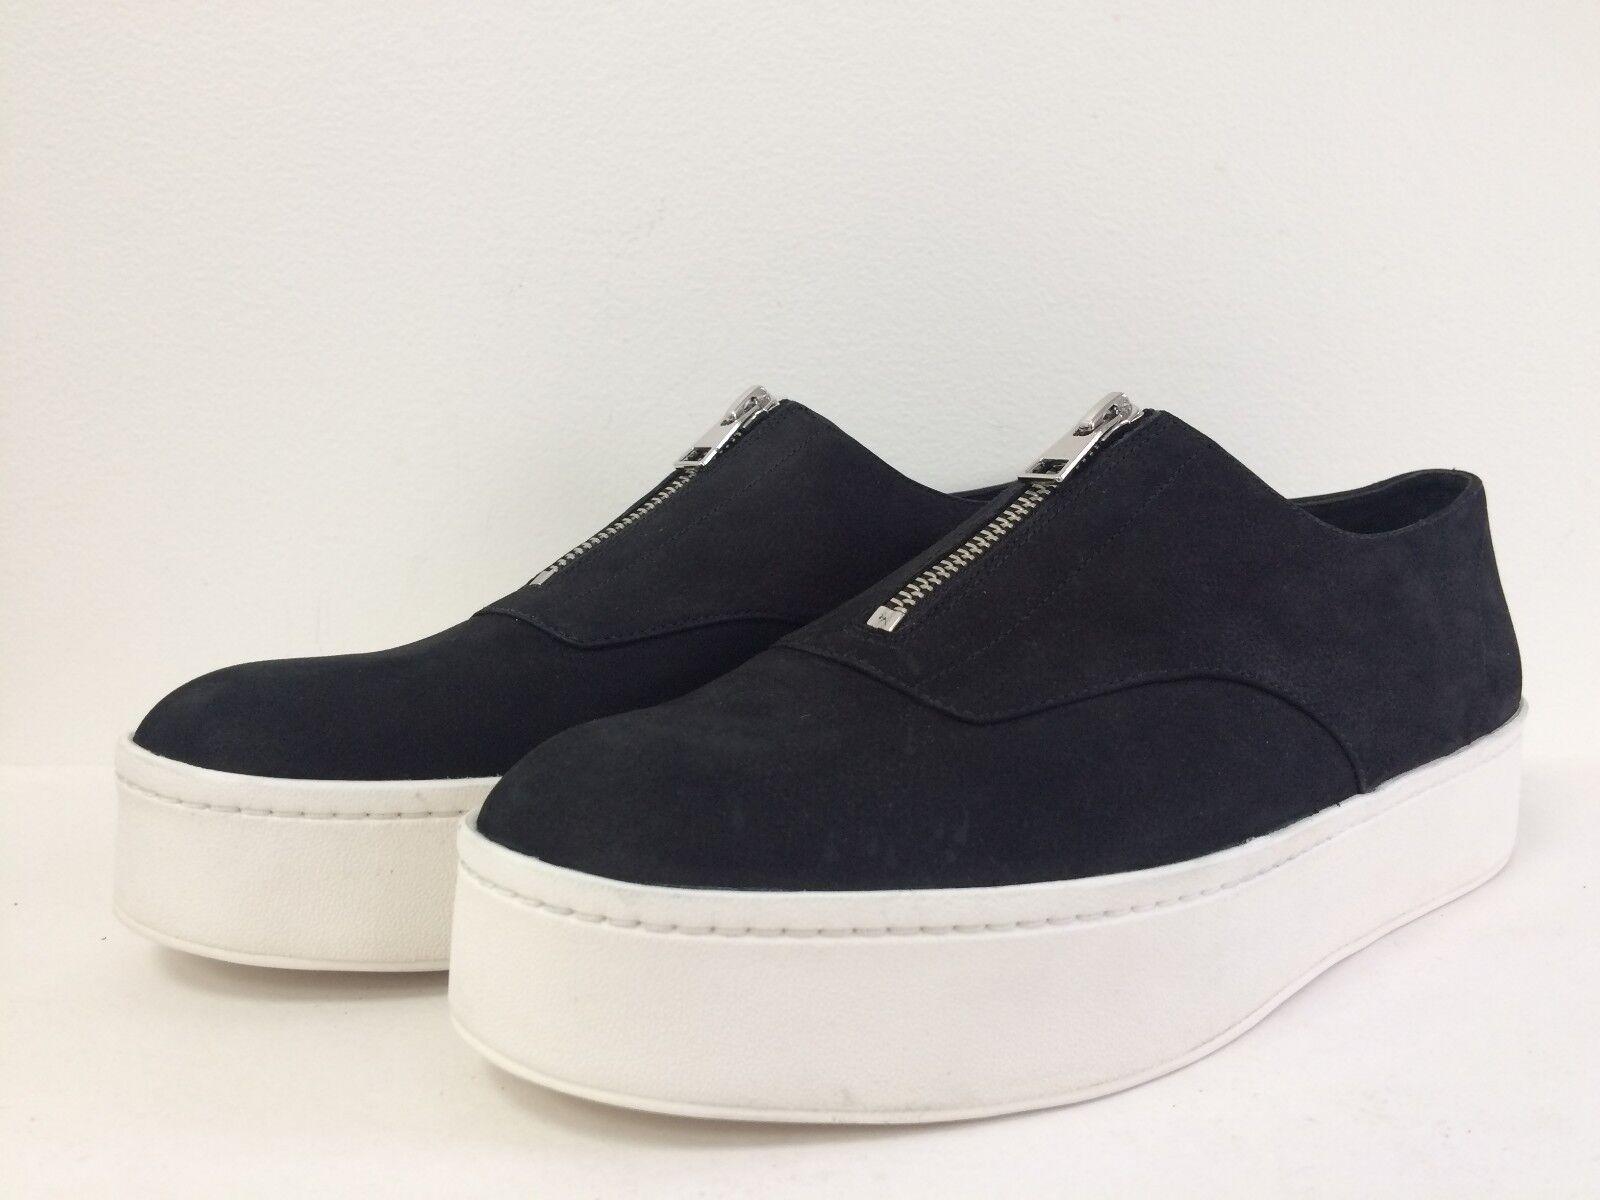 New VINCE Warner Nubuck Leather Platform Slip On Zip Zip Zip scarpe da ginnastica BLK grigio 8.5 9 9.5 70b17f